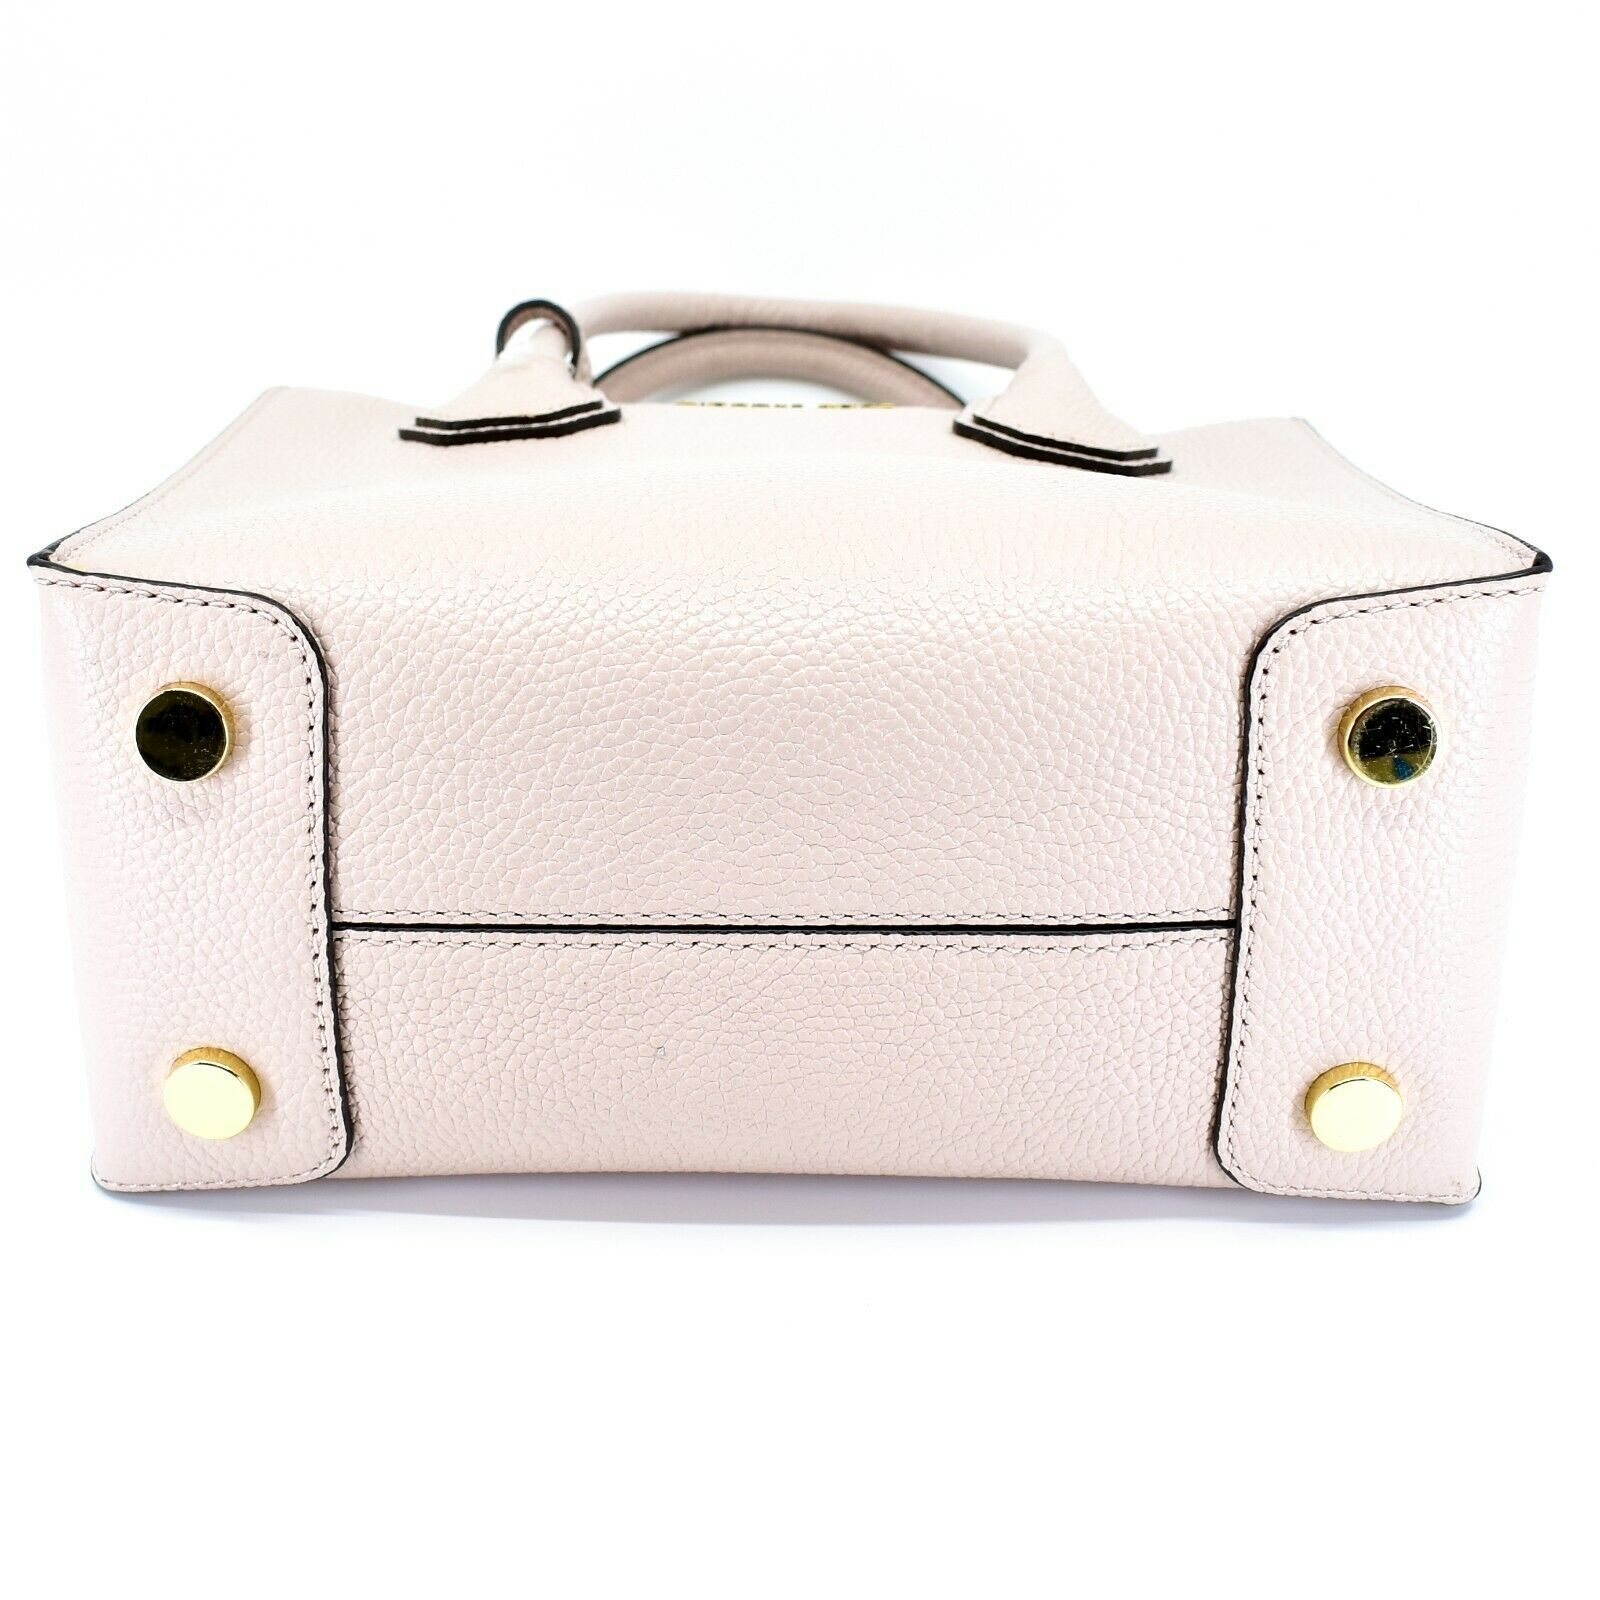 Michael Kors Mercer Soft Pink Pebbled Leather Medium Crossbody Messenger Bag image 5